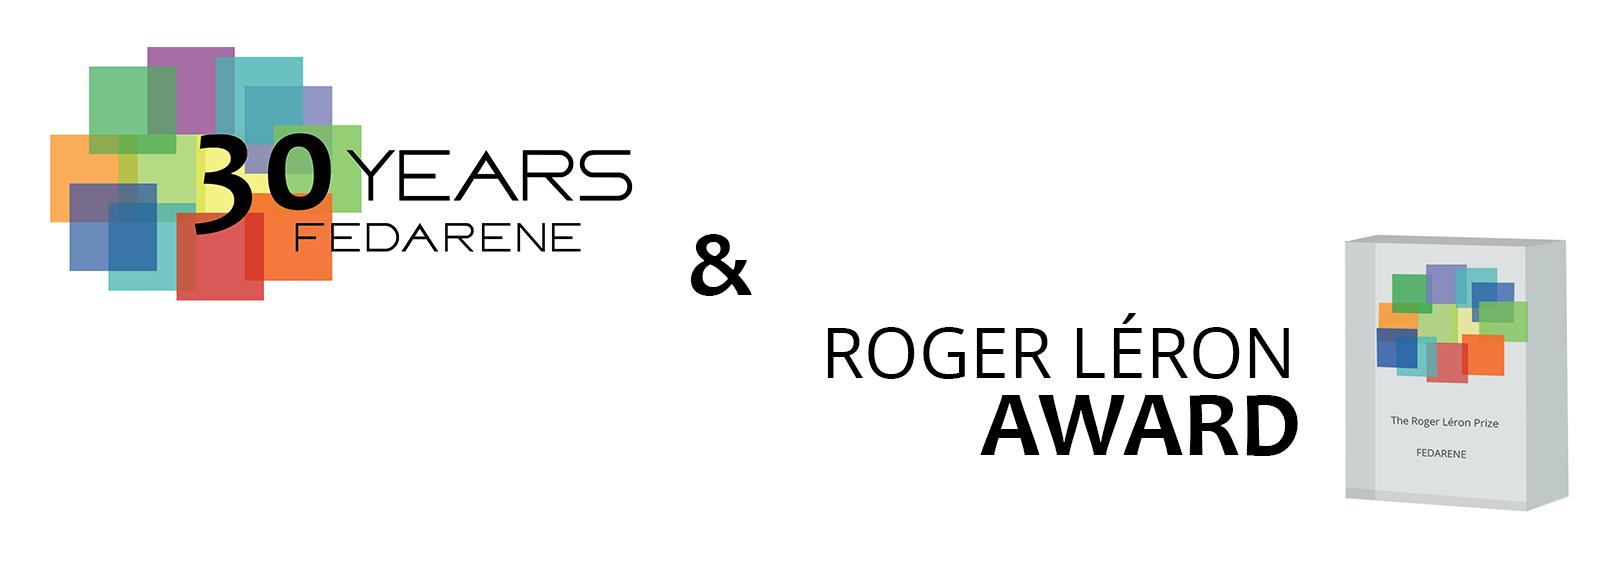 Roger Léron Award 2020